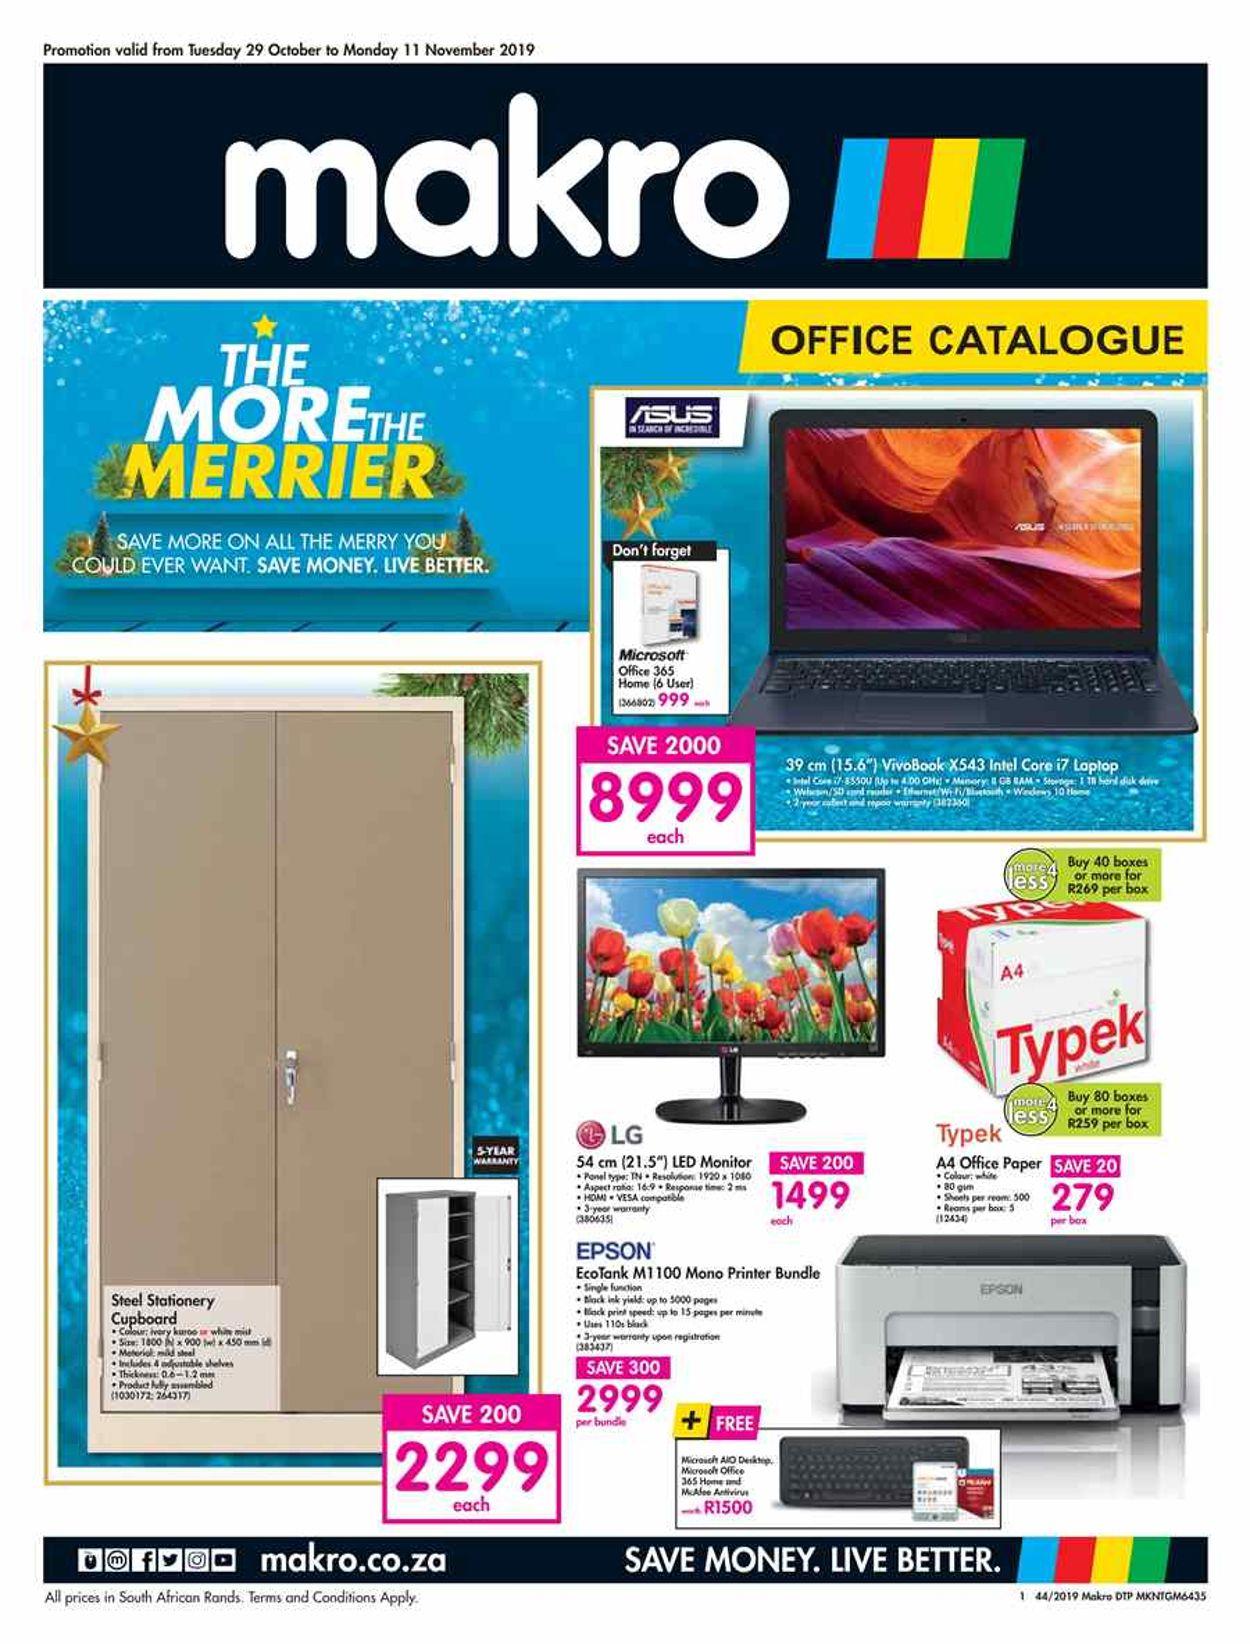 Makro Catalogue - 2019/10/29-2019/11/11